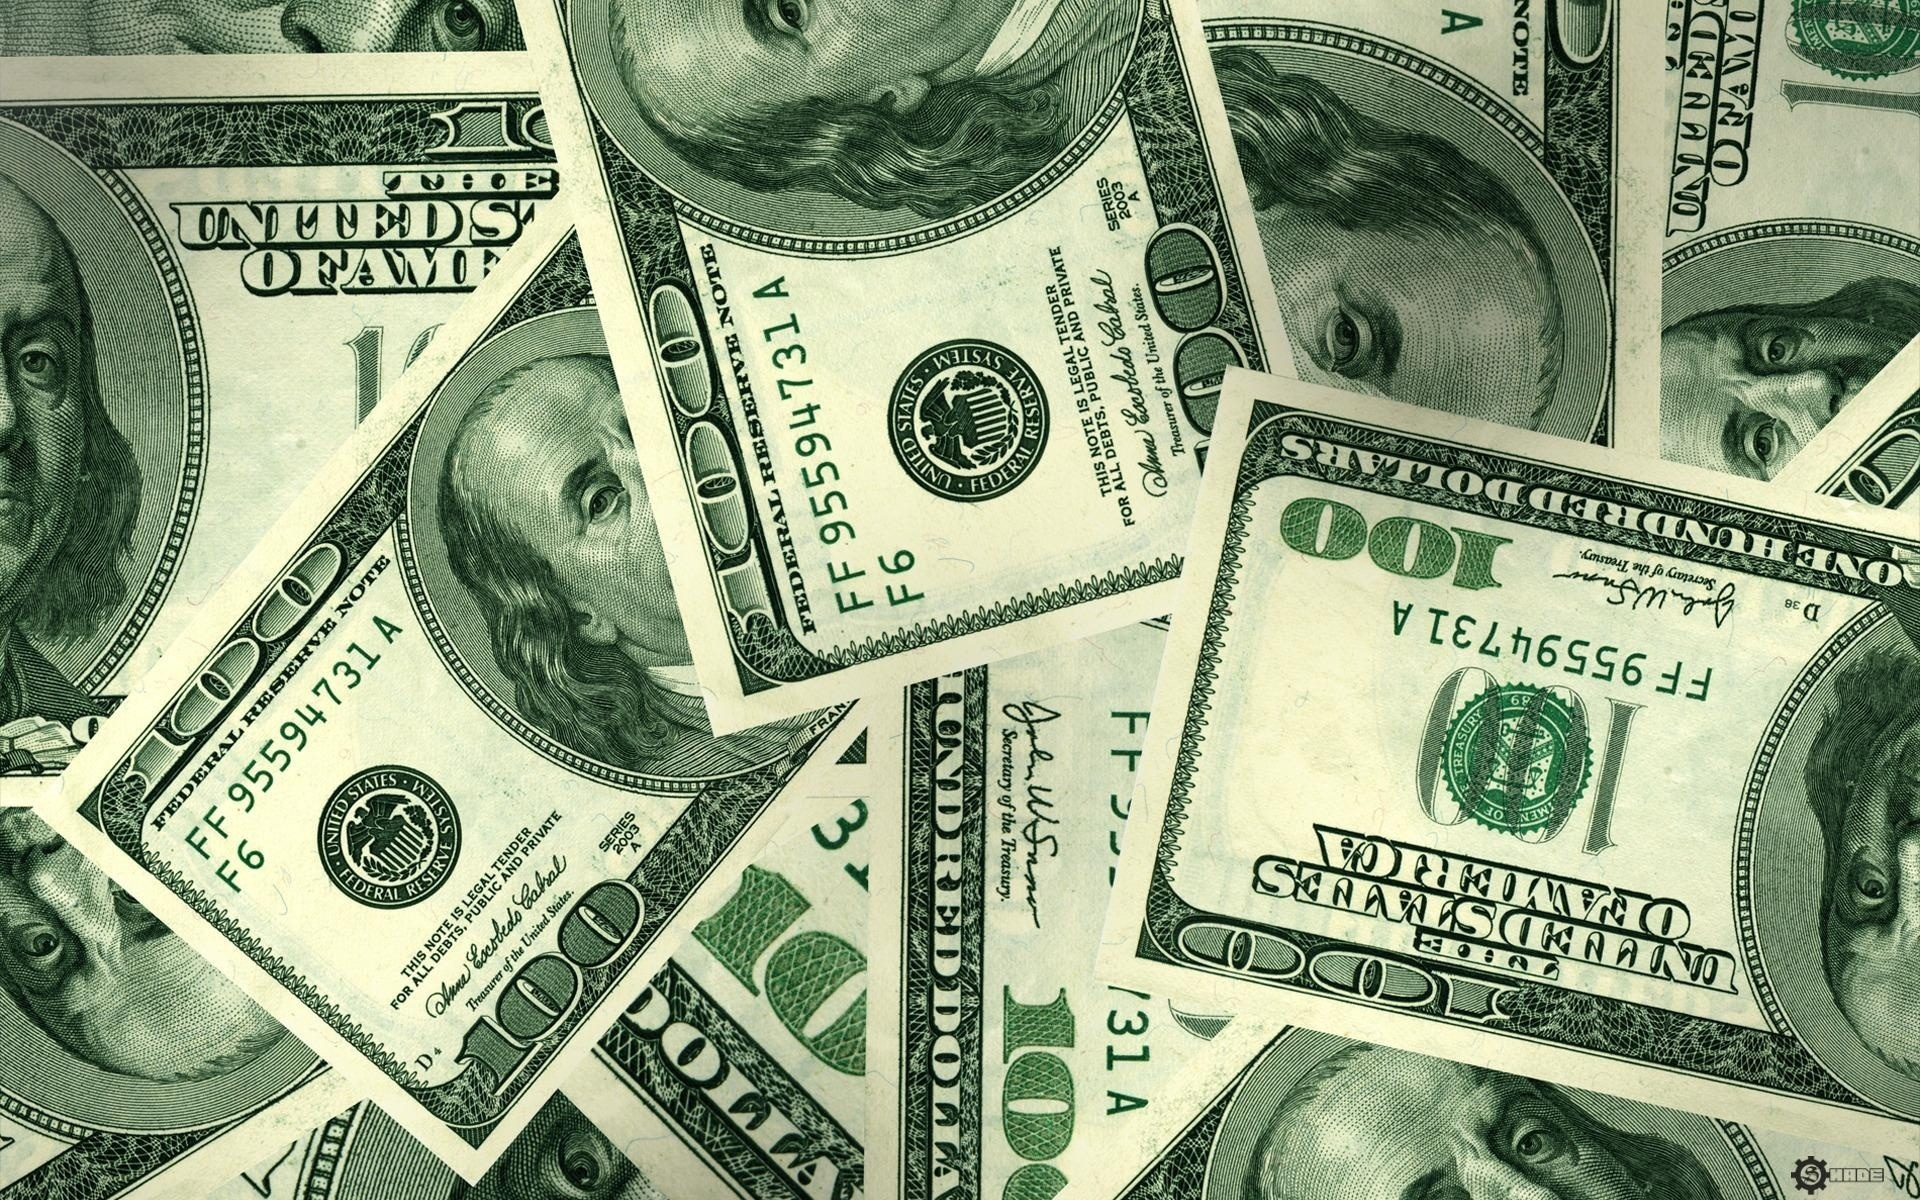 обои доллары, баксы, купюры, зеленые картинки фото